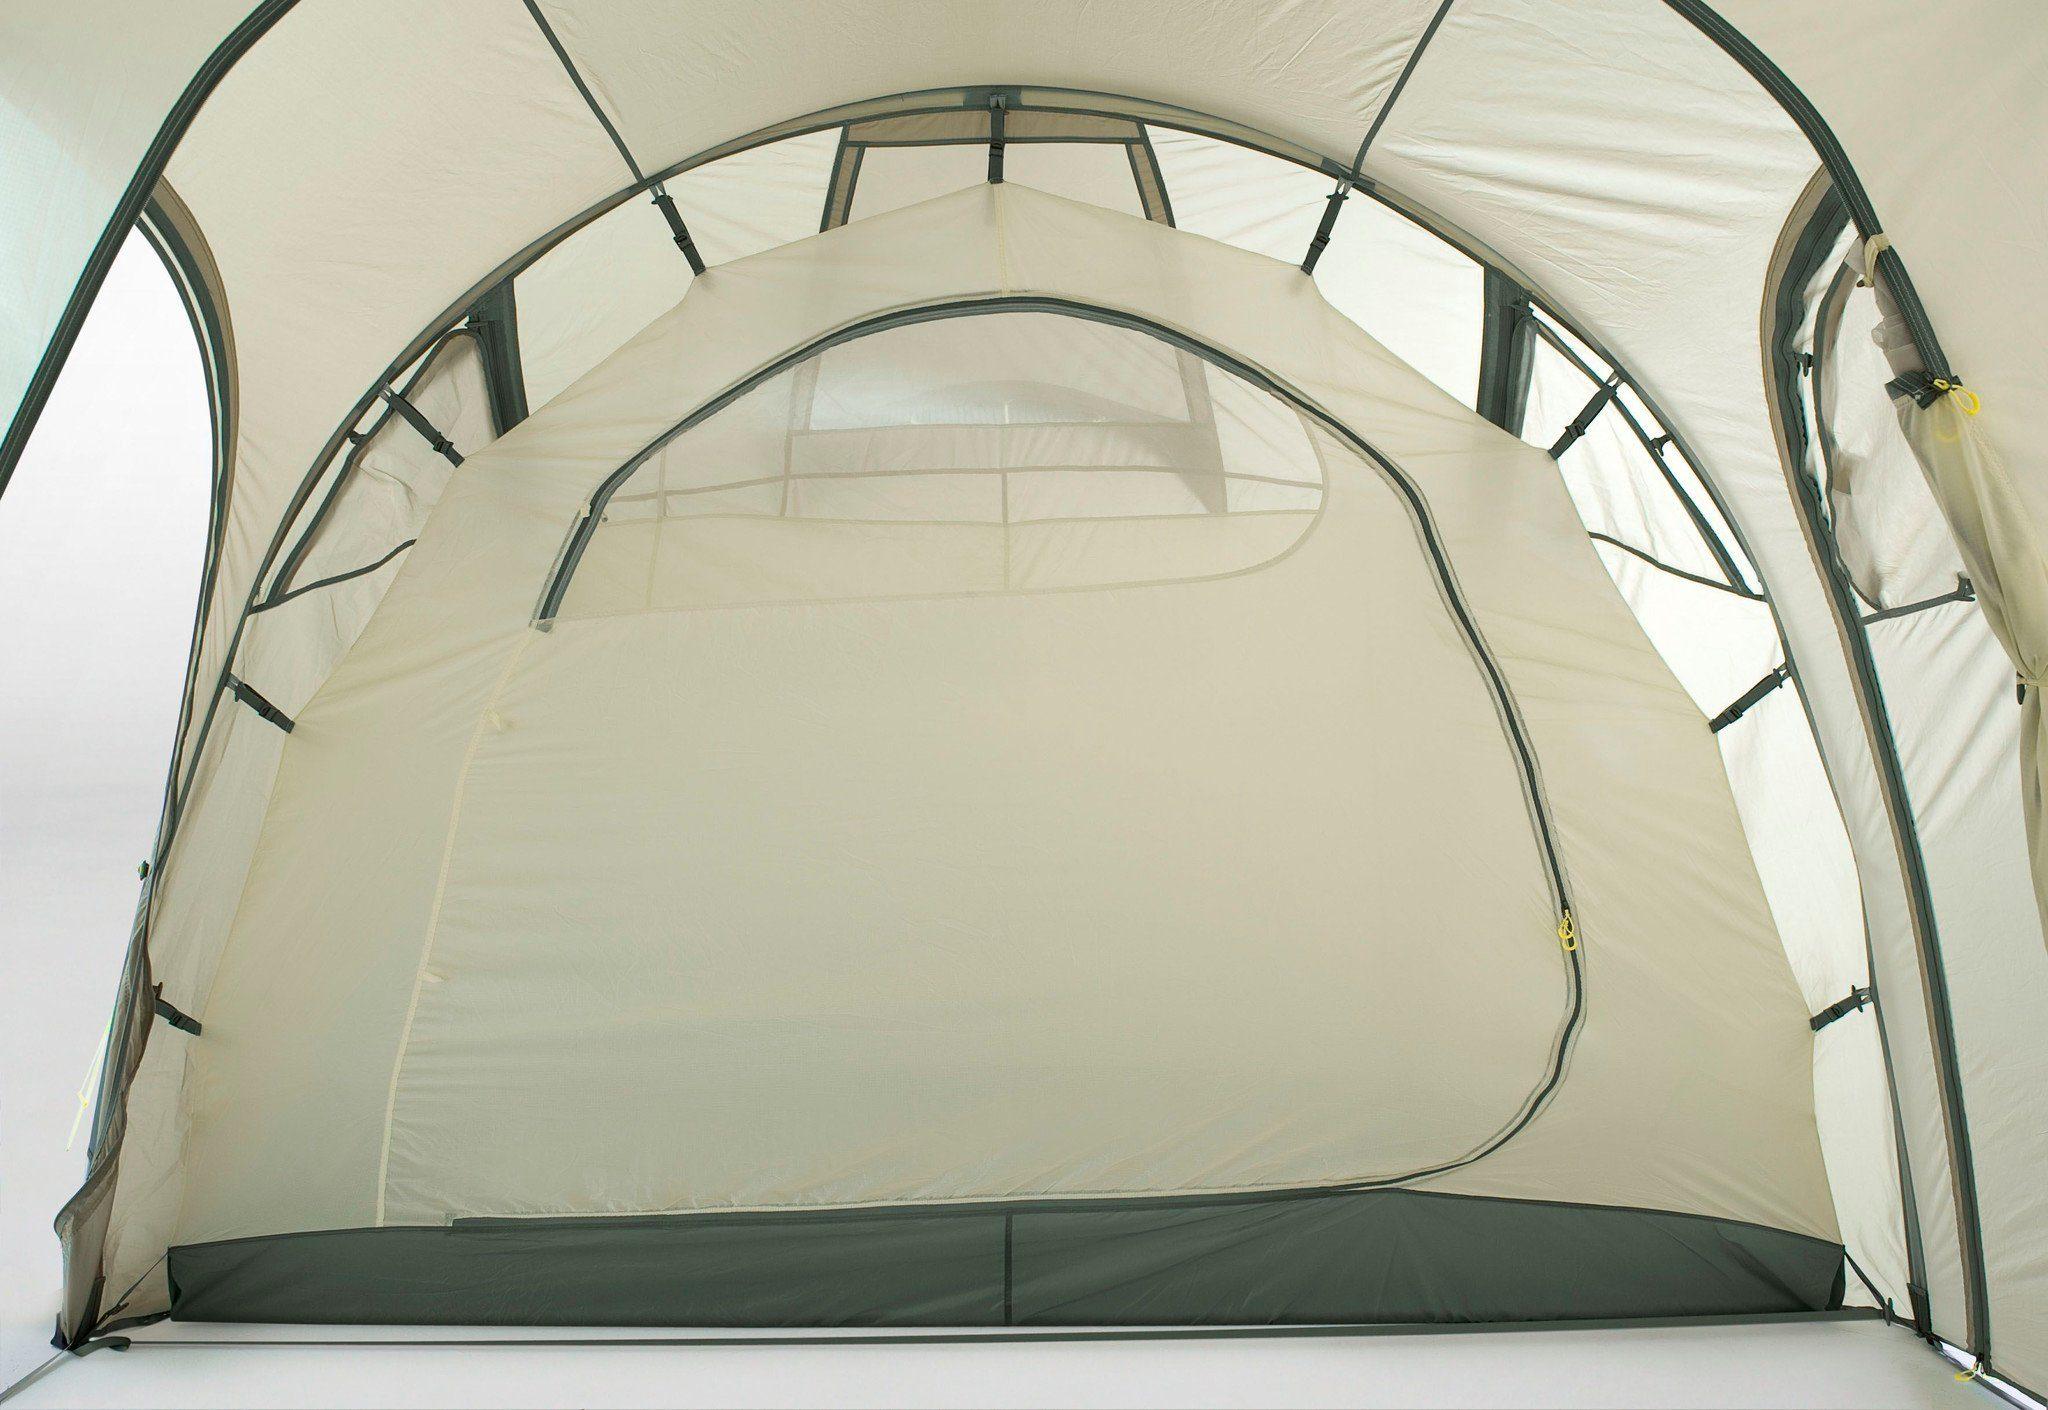 Tatonka Zeltzubehör »Family Camp Extension Tent«